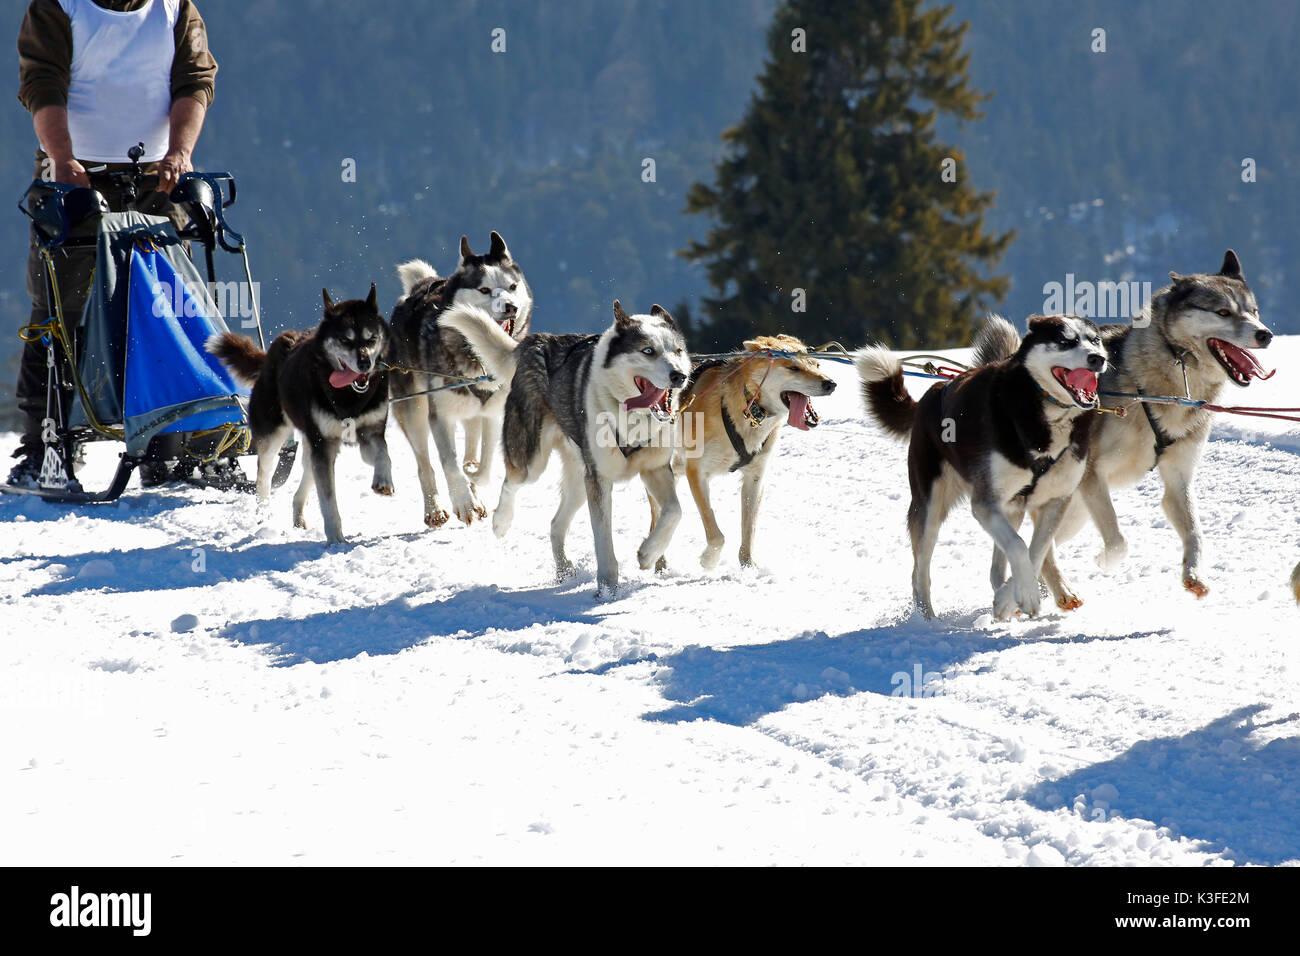 Slide dog's races - Stock Image